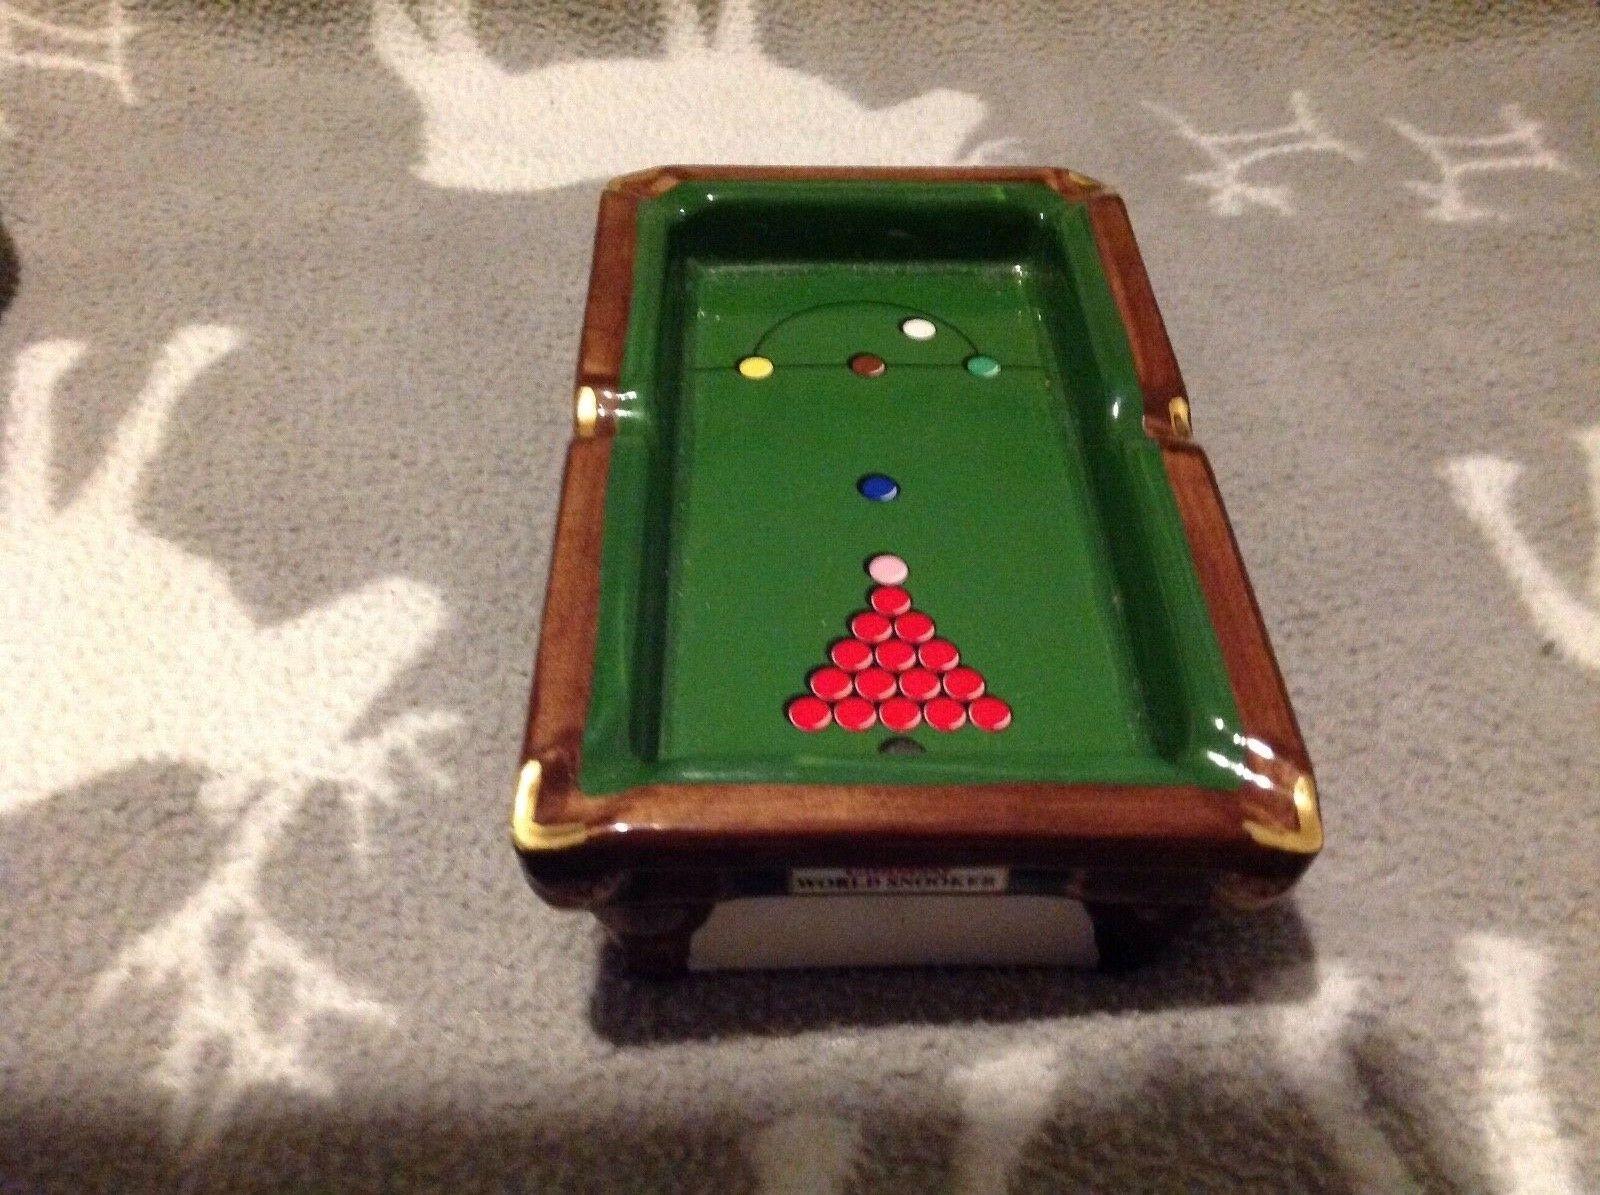 Embassy World Snooker Table Ashtray LTD Edition